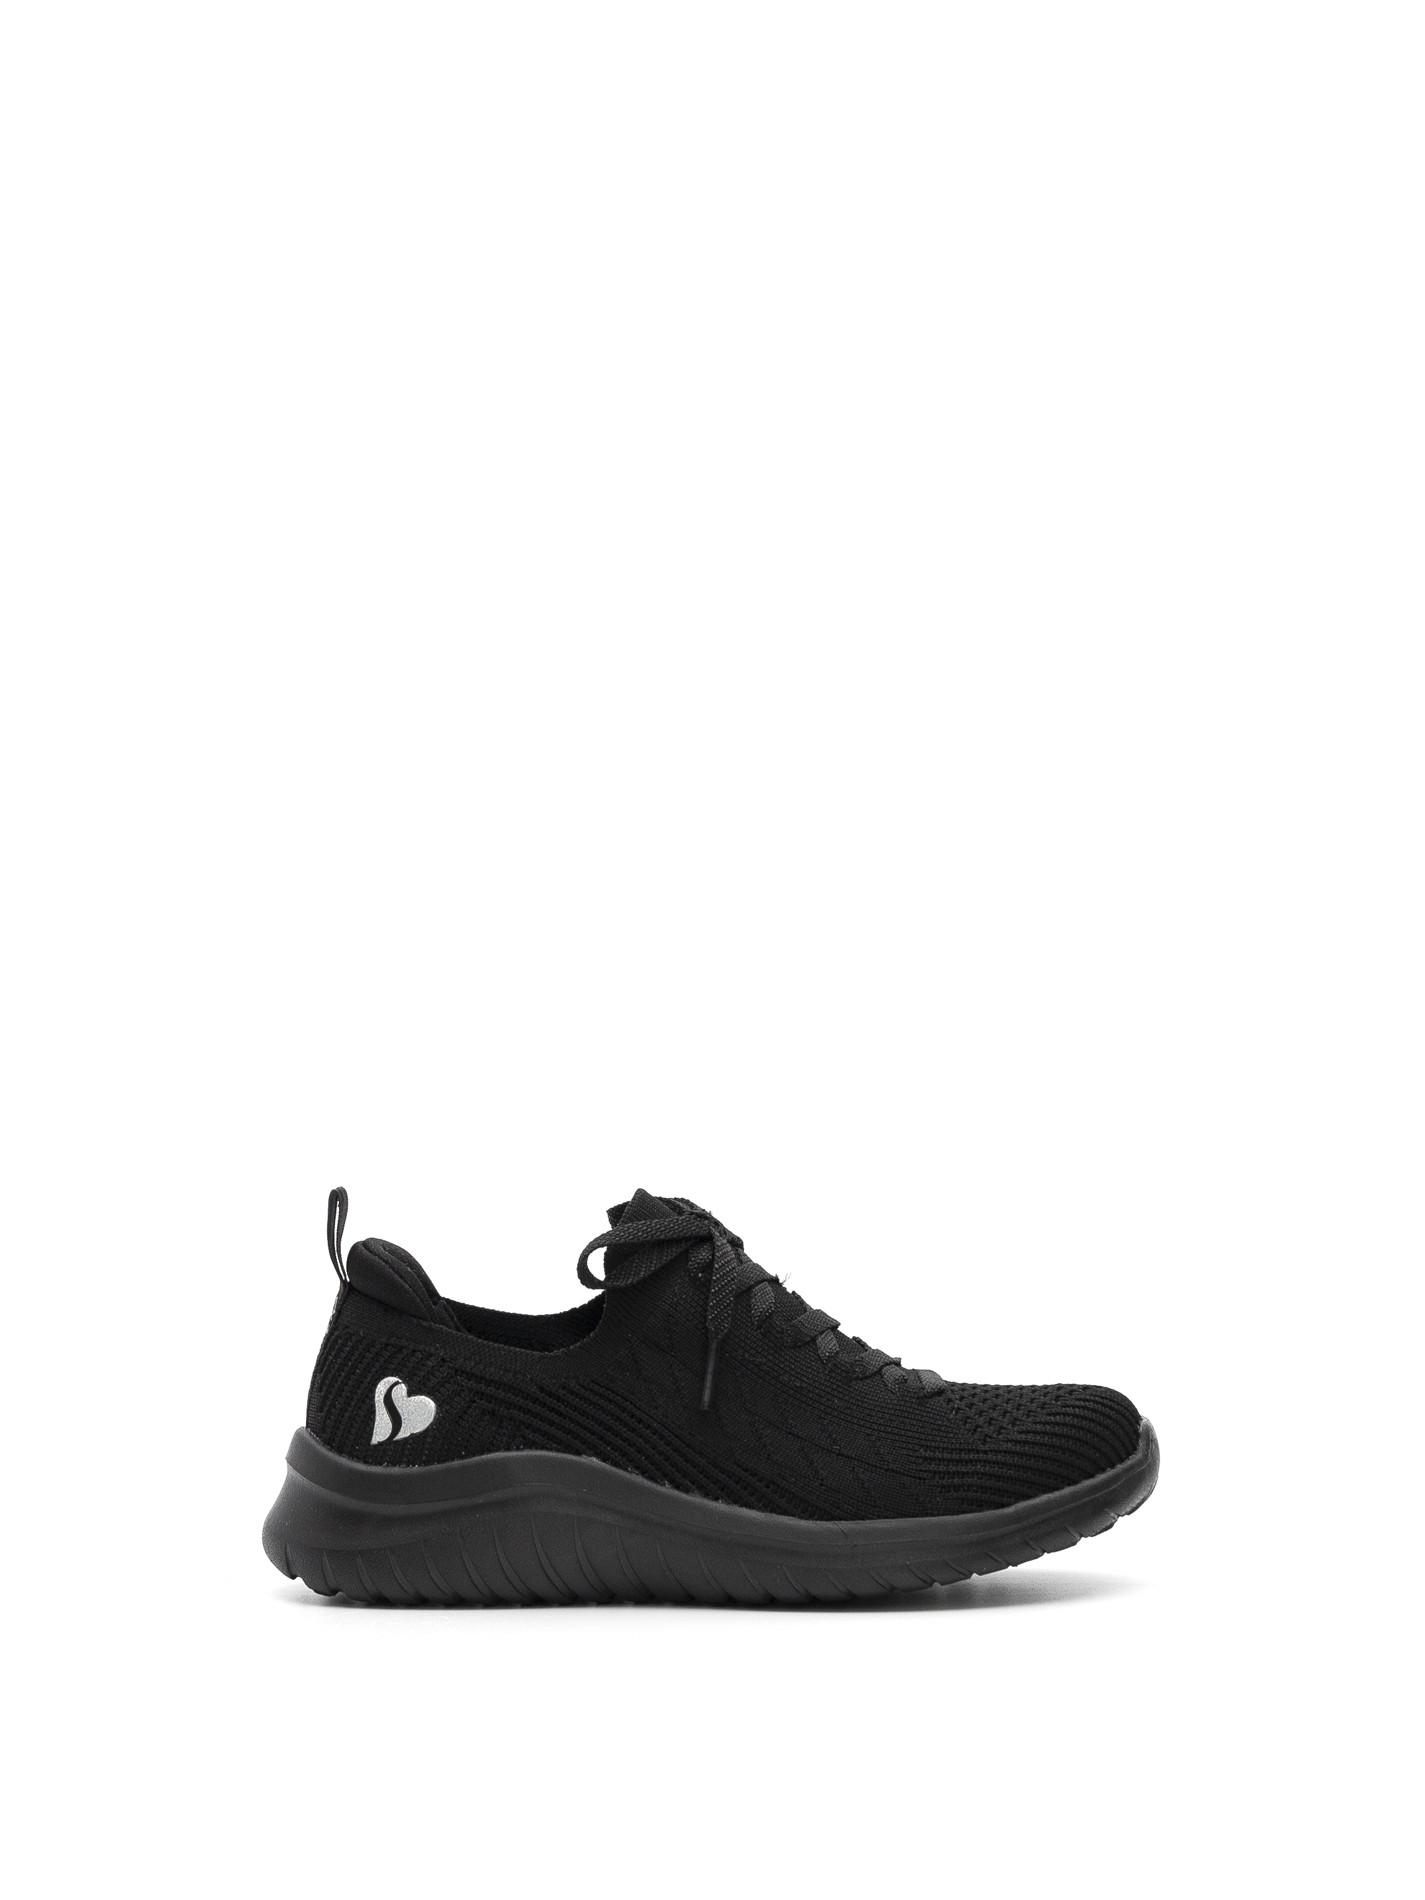 Ultra flex 2.0 jr - Black